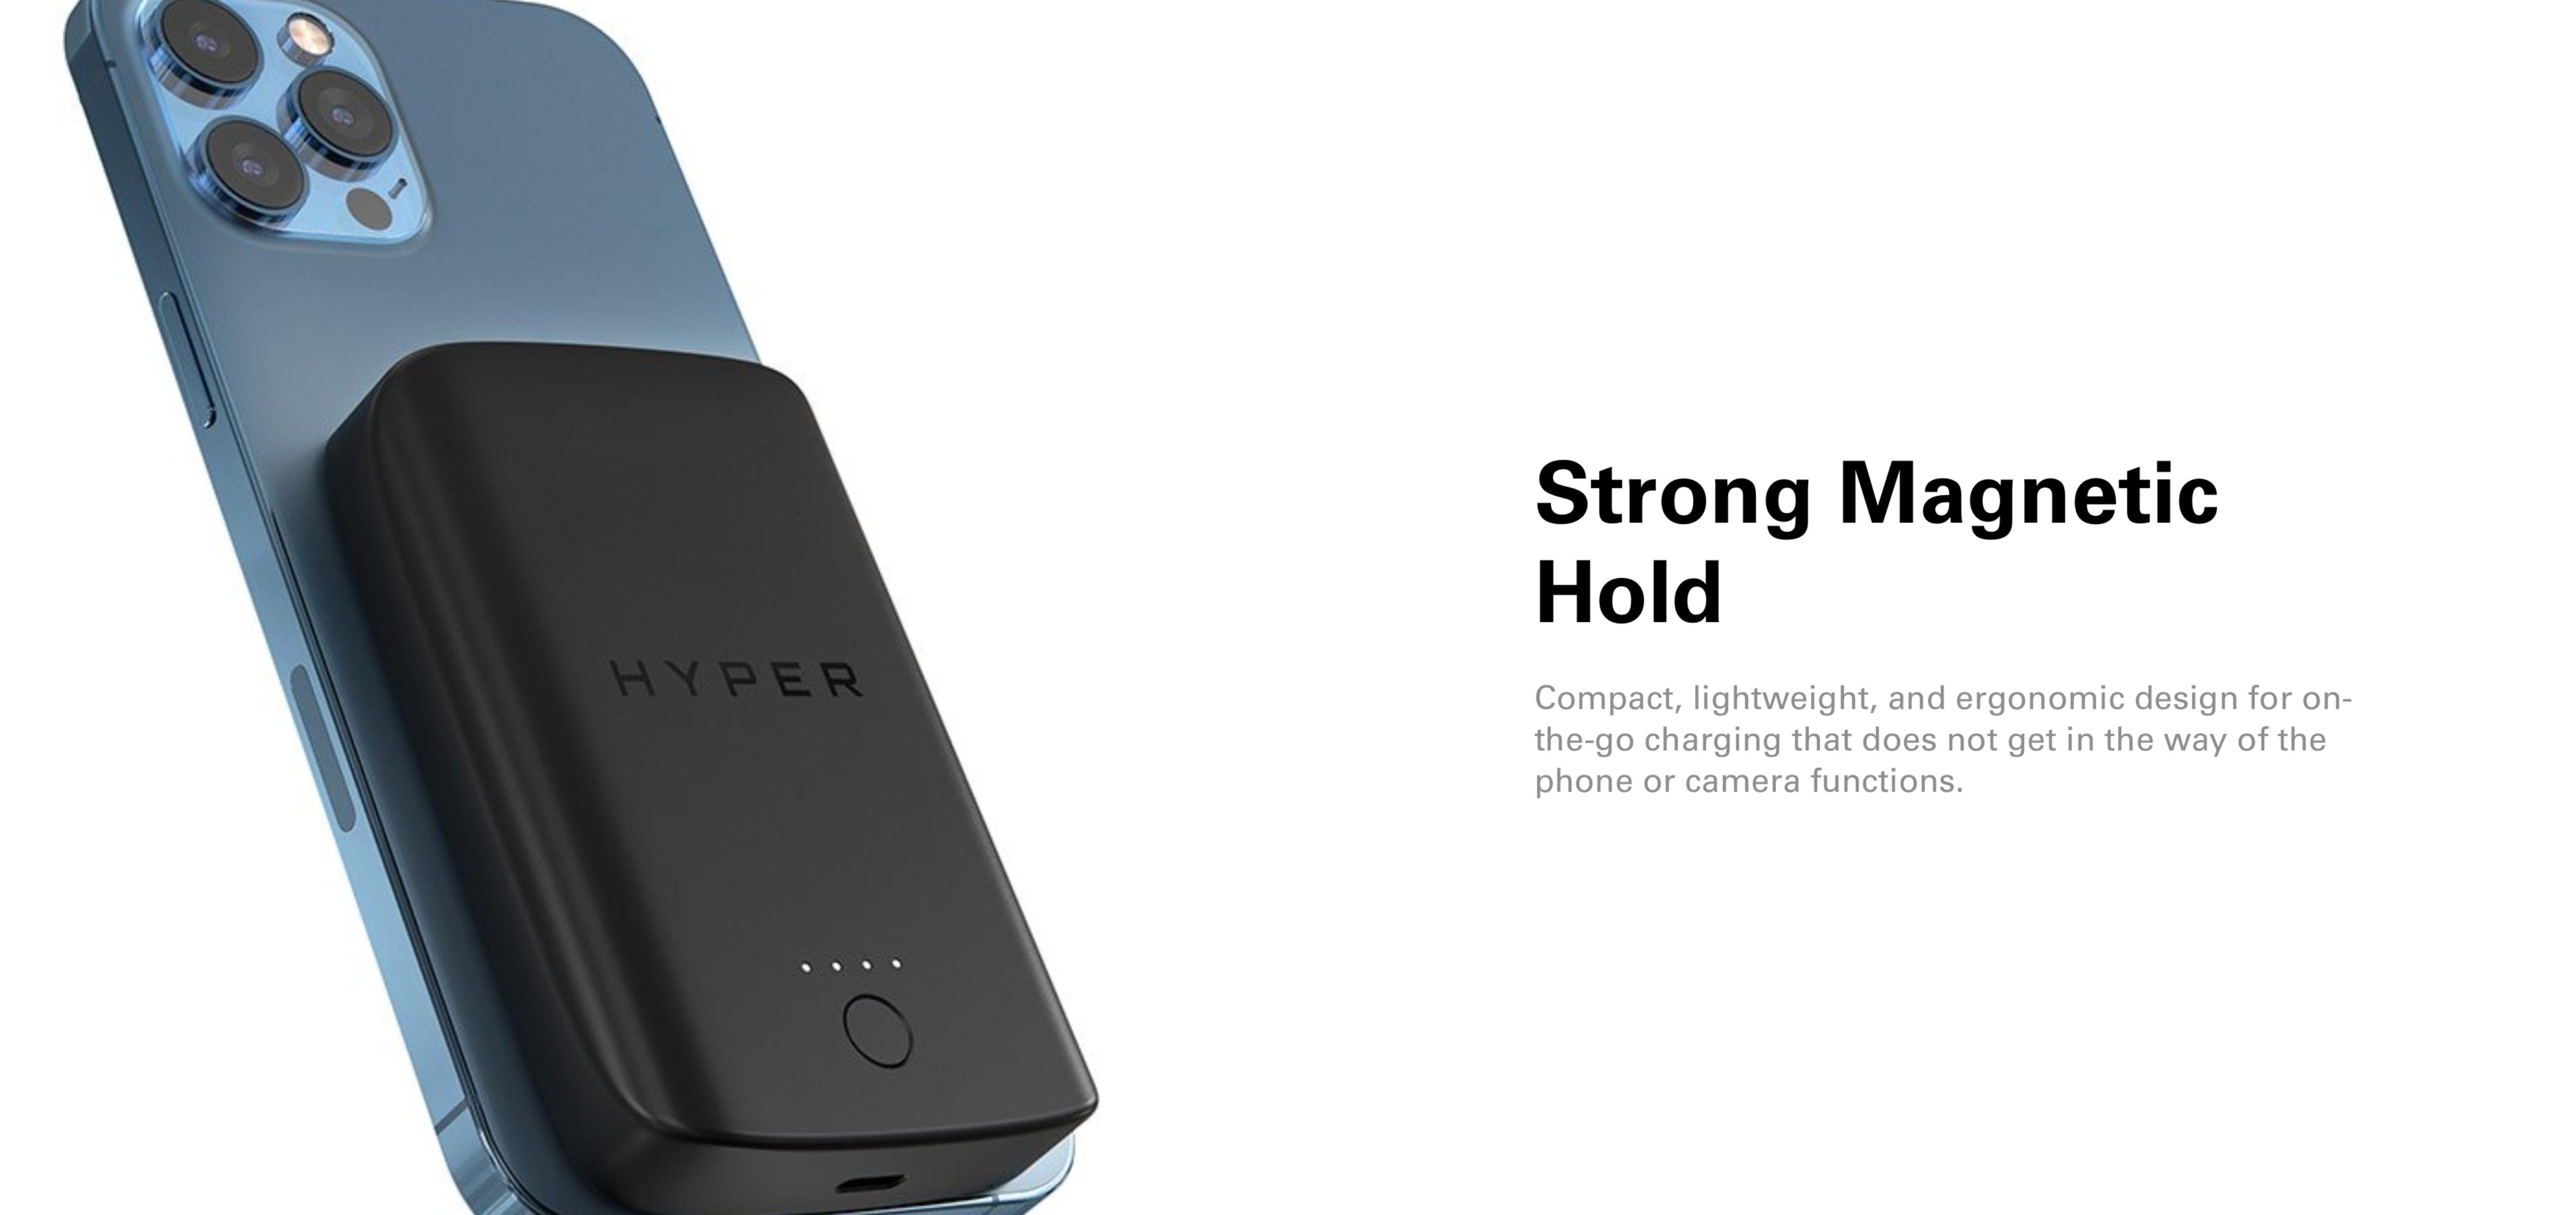 Hyper magnetic powerbank